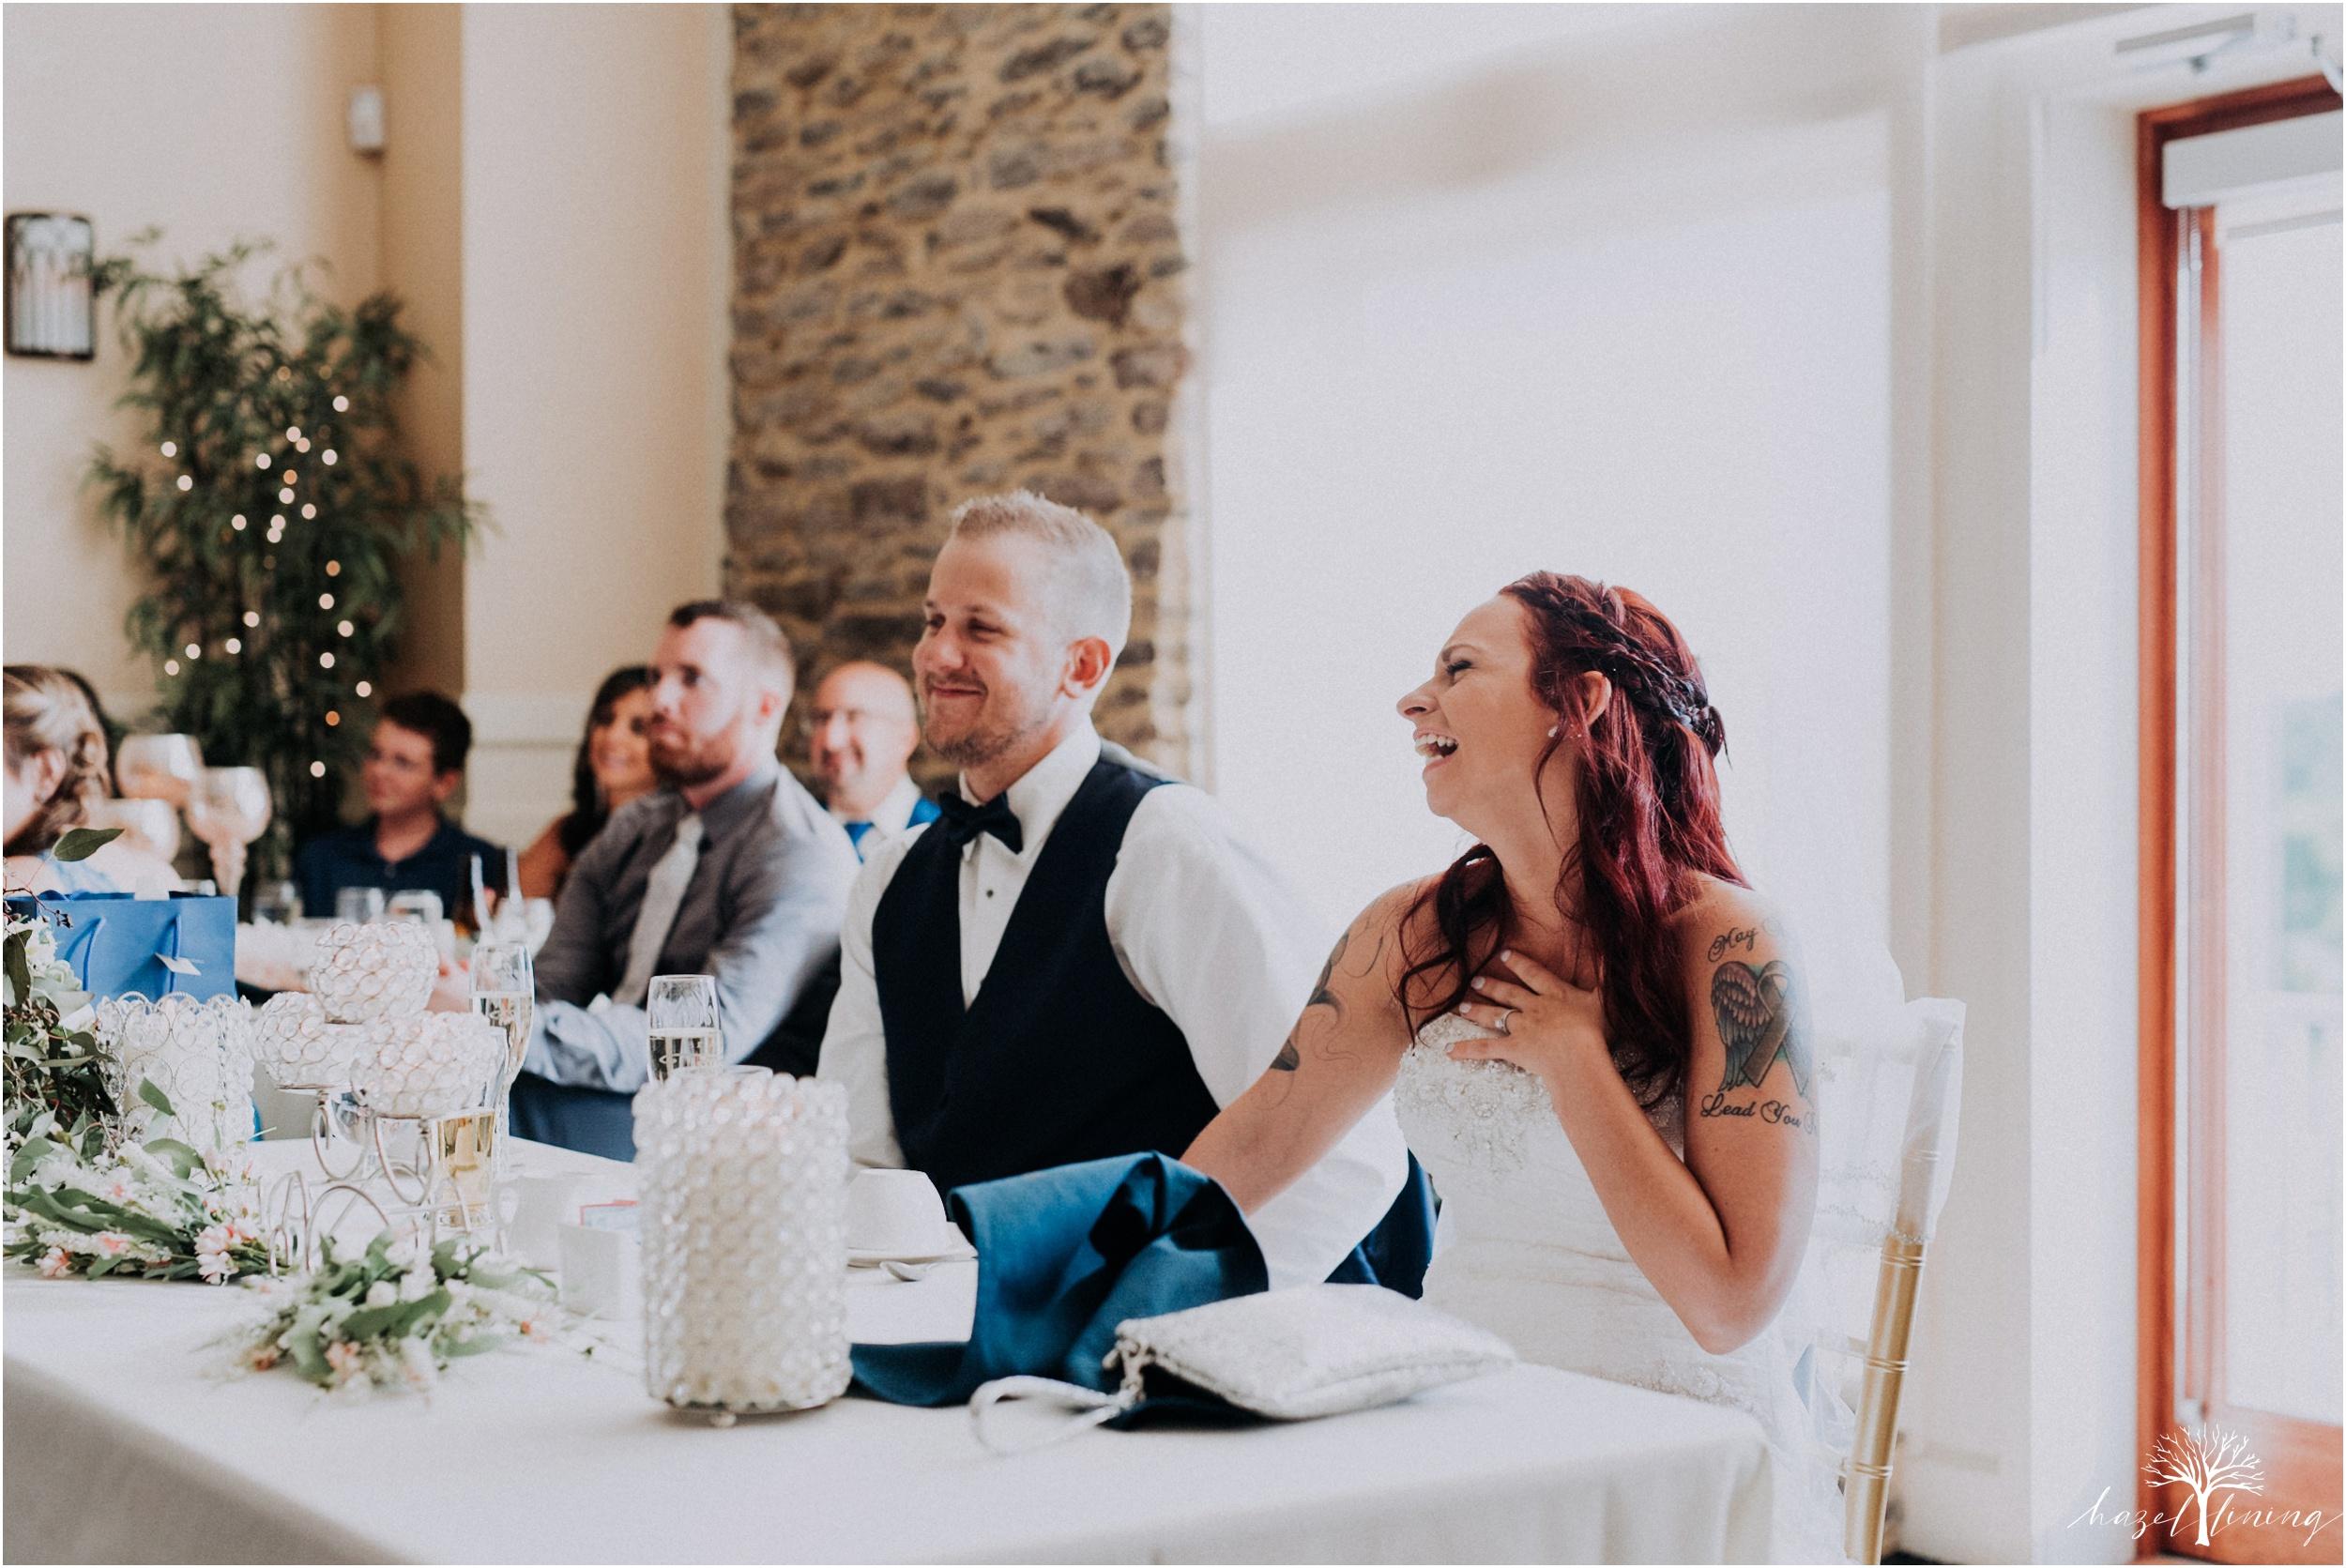 alyssa-james-stiteler-wedding-loft-and-sweet-water-cc-pennsburg-pennsylvania-hazel-lining-travel-wedding-elopement-photography_0120.jpg